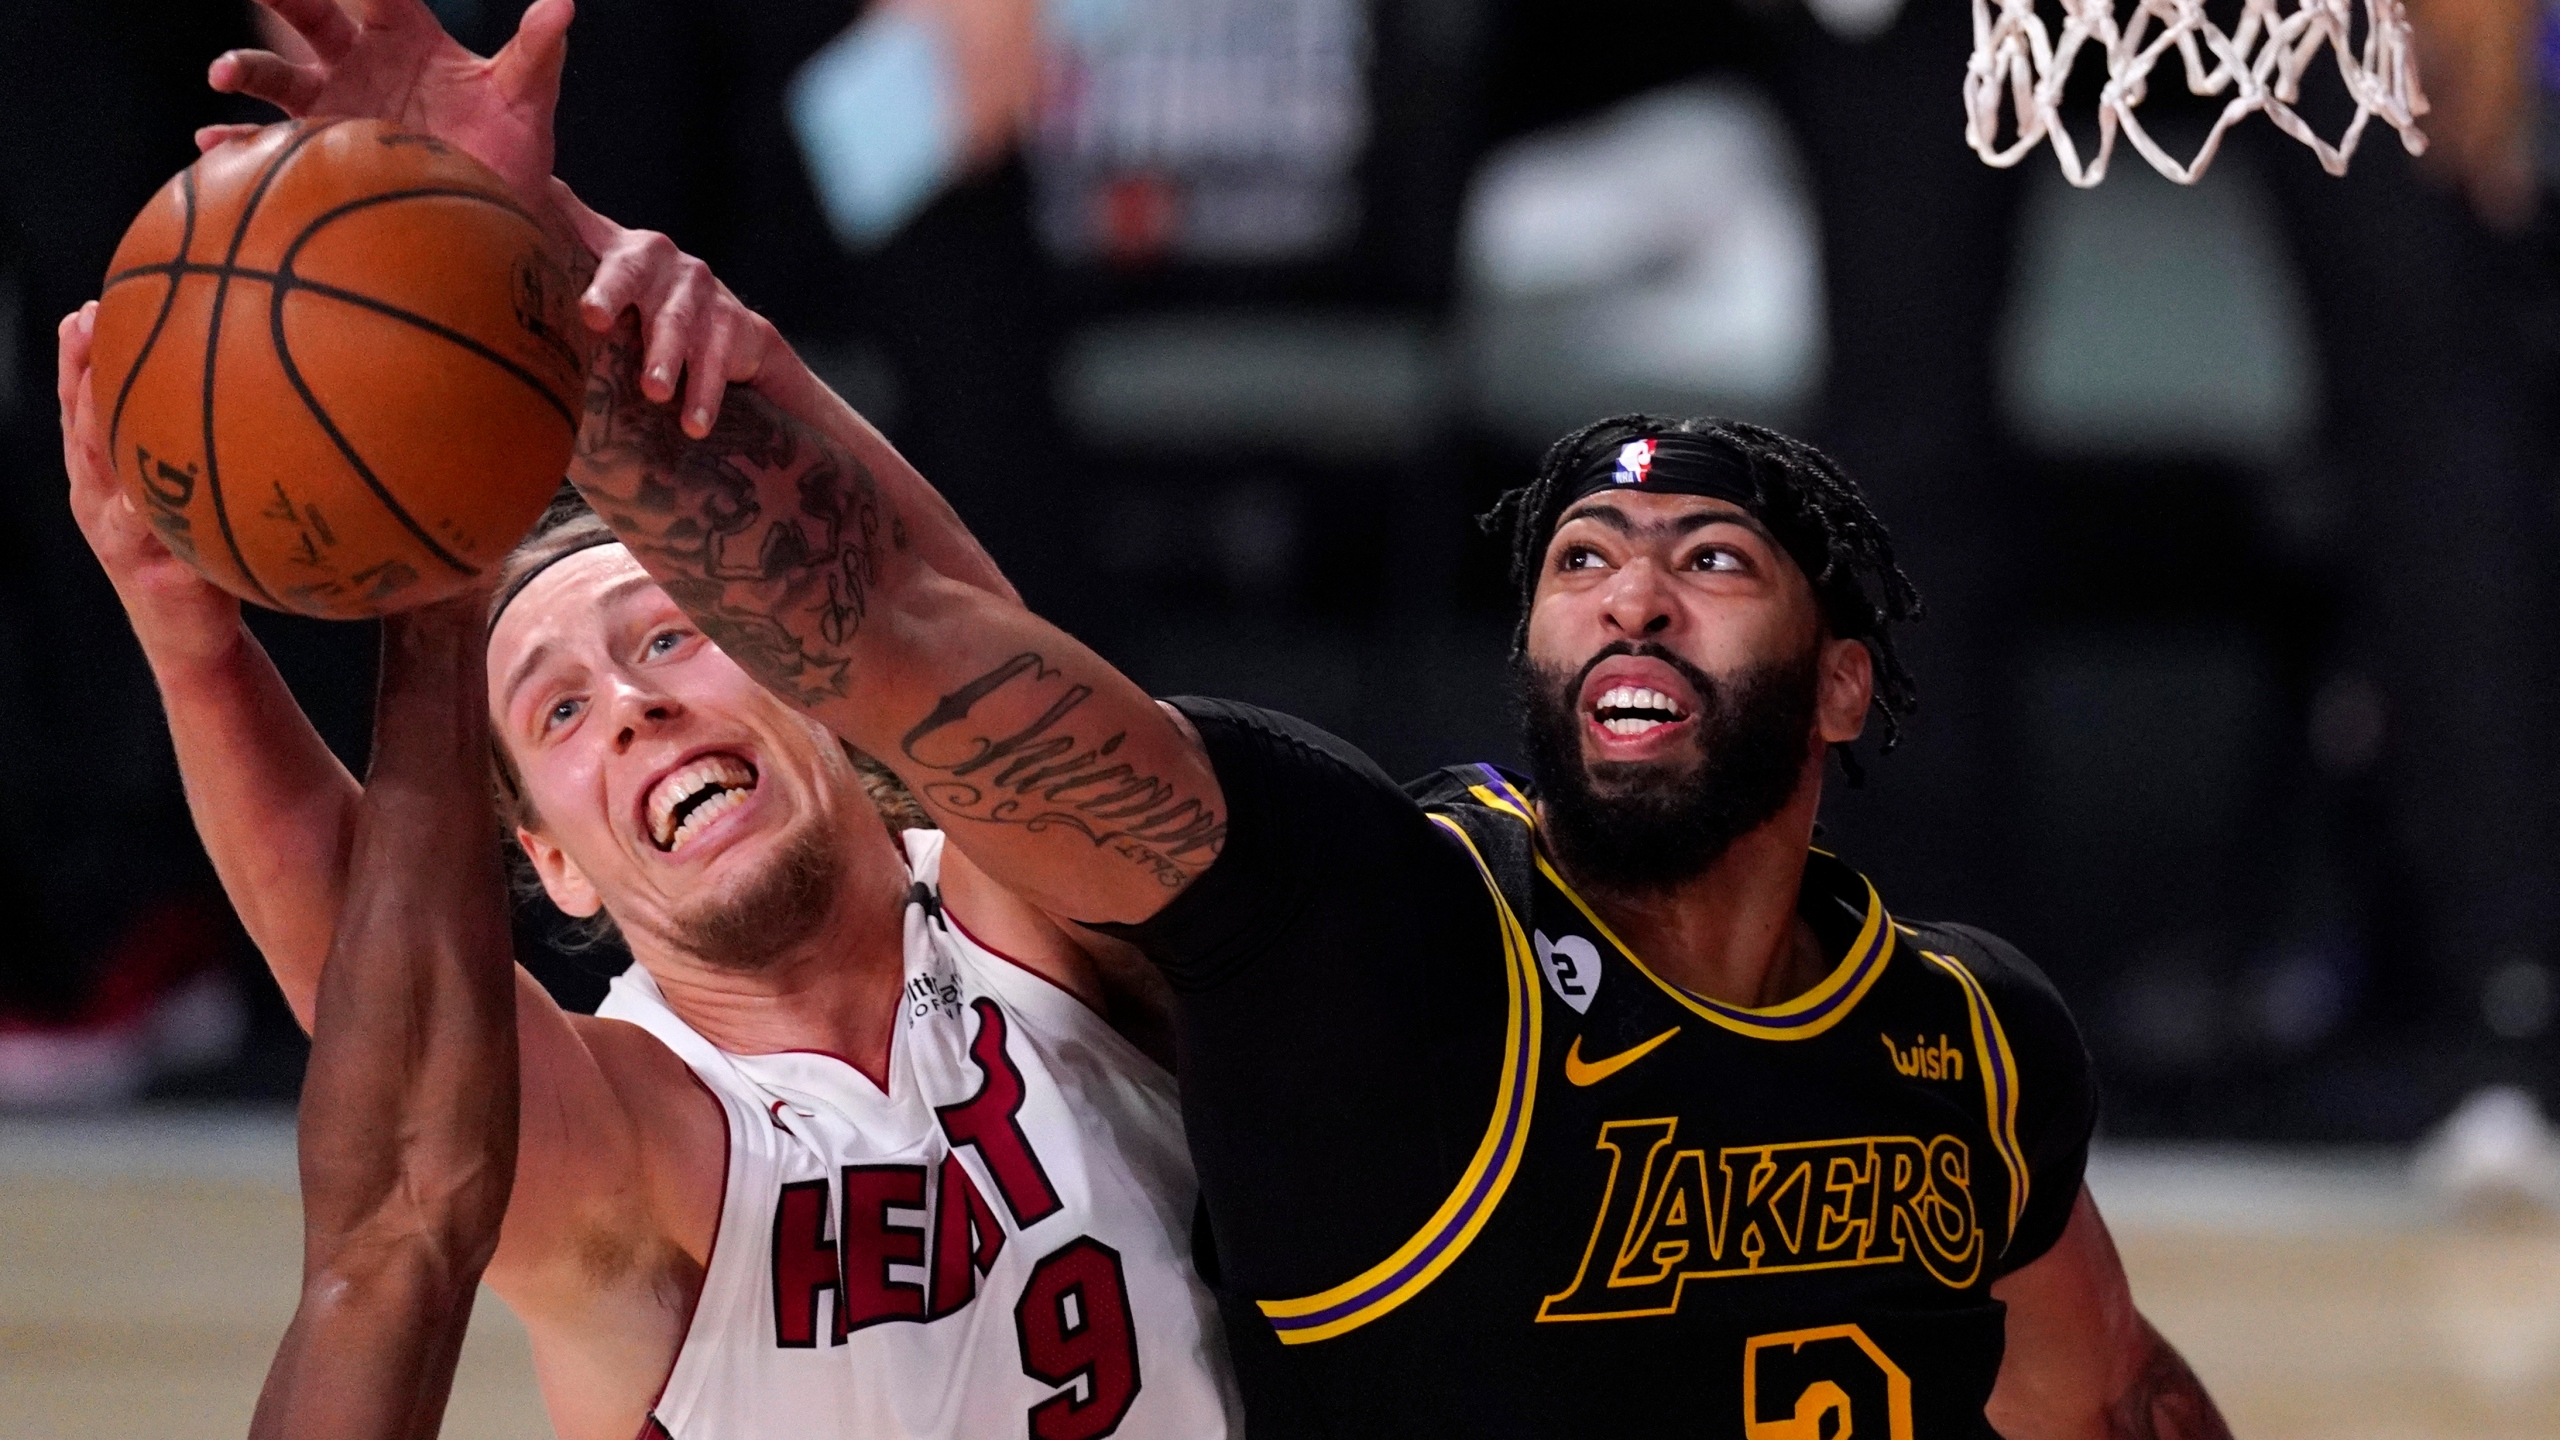 Halfway Home Lakers Top Heat 124 114 For 2 0 Finals Lead Ksnf Kode Fourstateshomepage Com